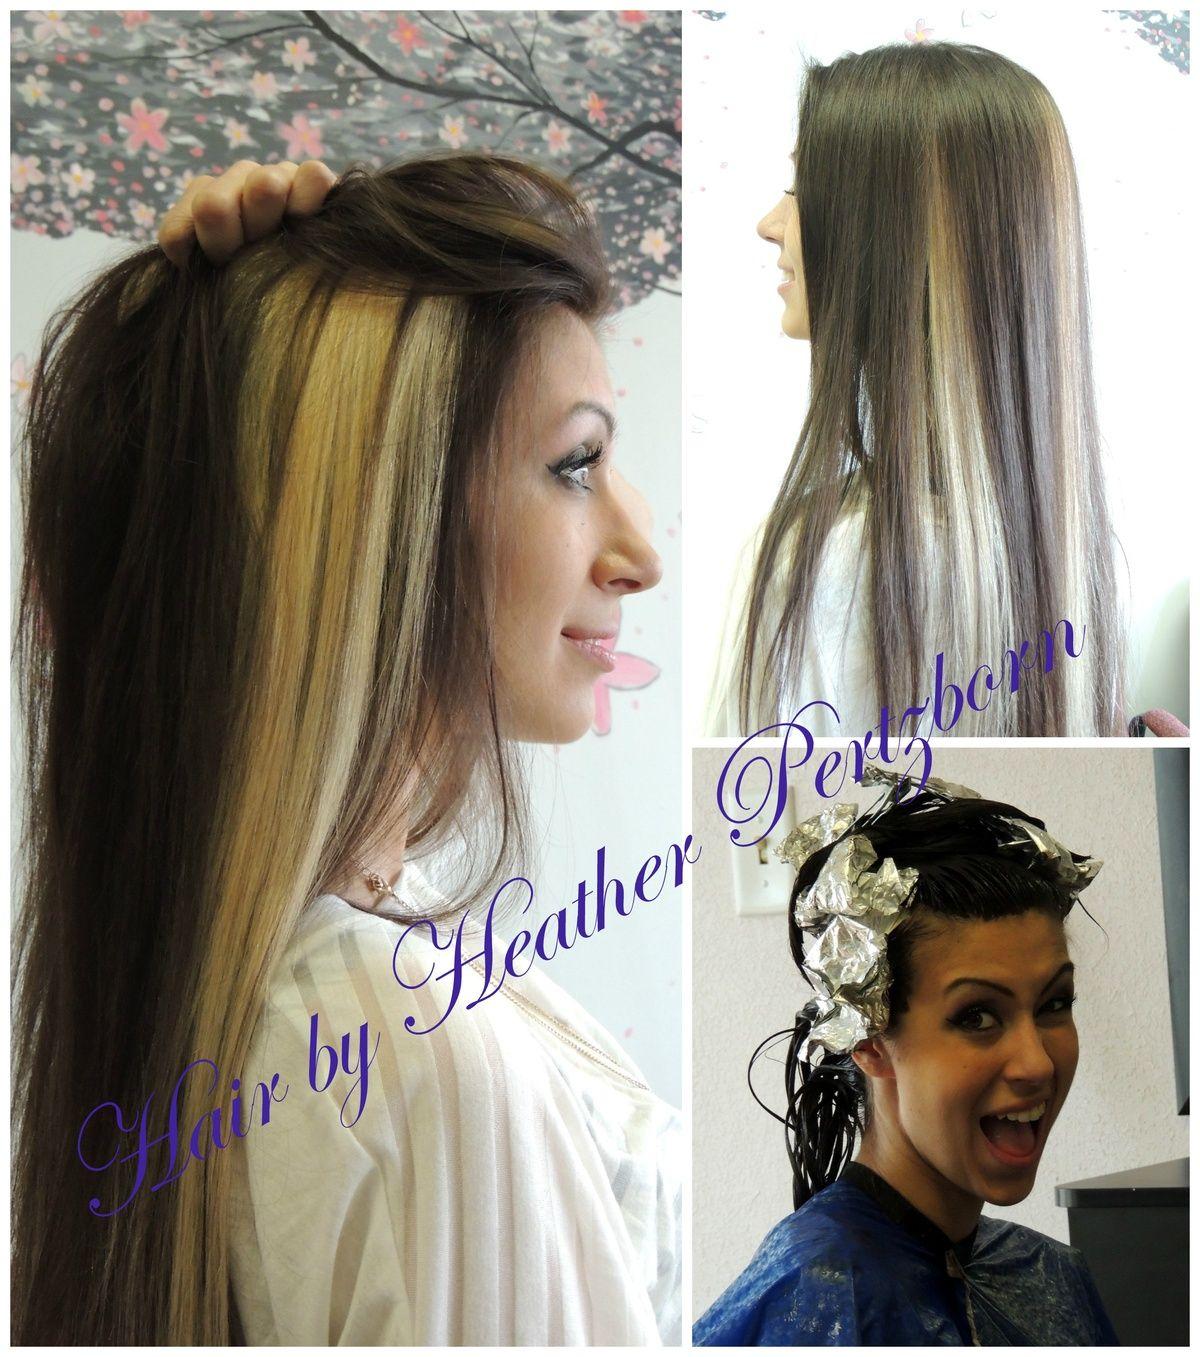 Cc12796cede51997ee5d418eda92efce Jpg 1 200 1 357 Pixels Hair